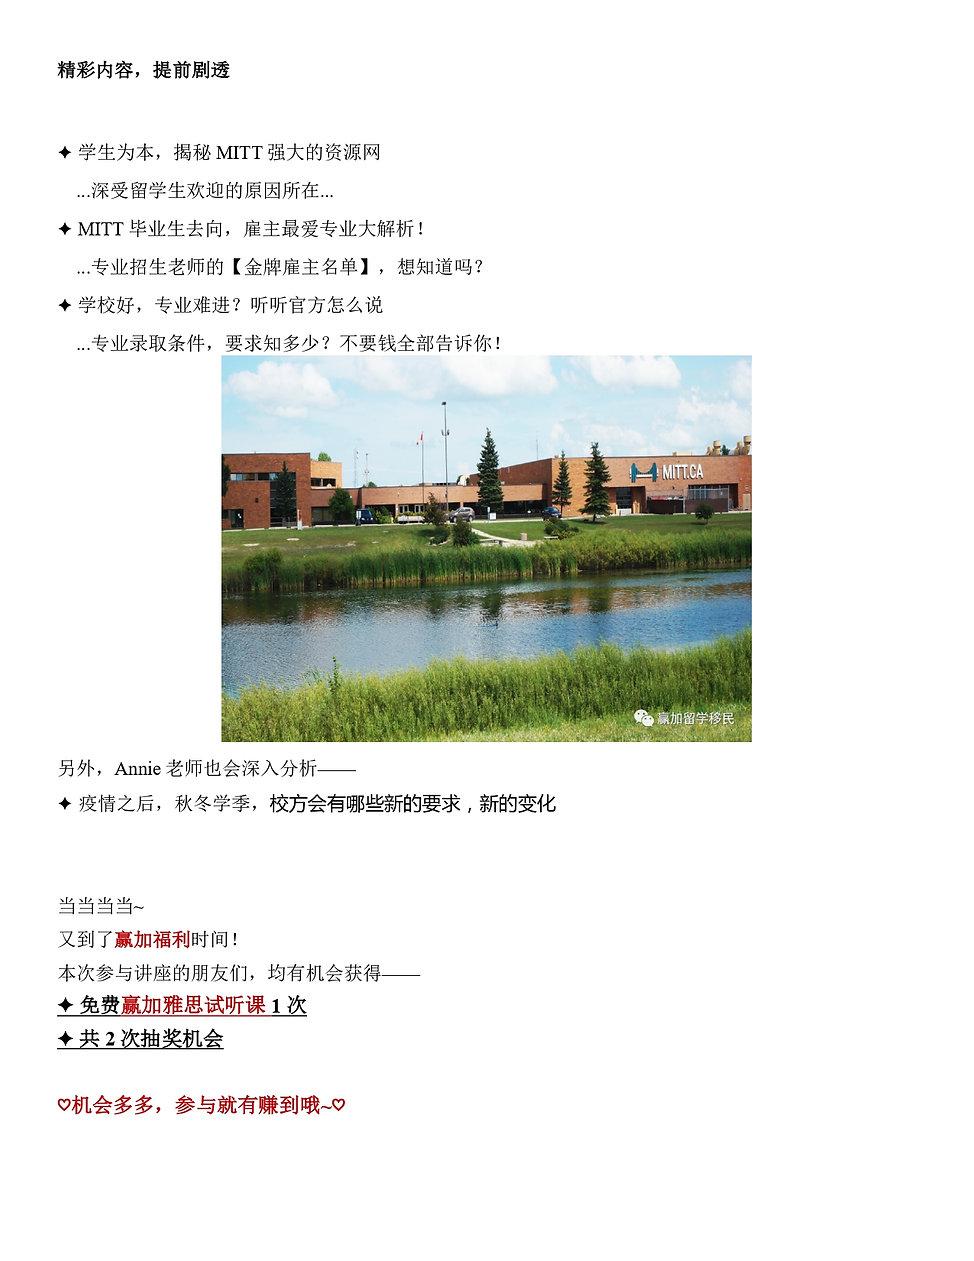 mitt_page-0002.jpg